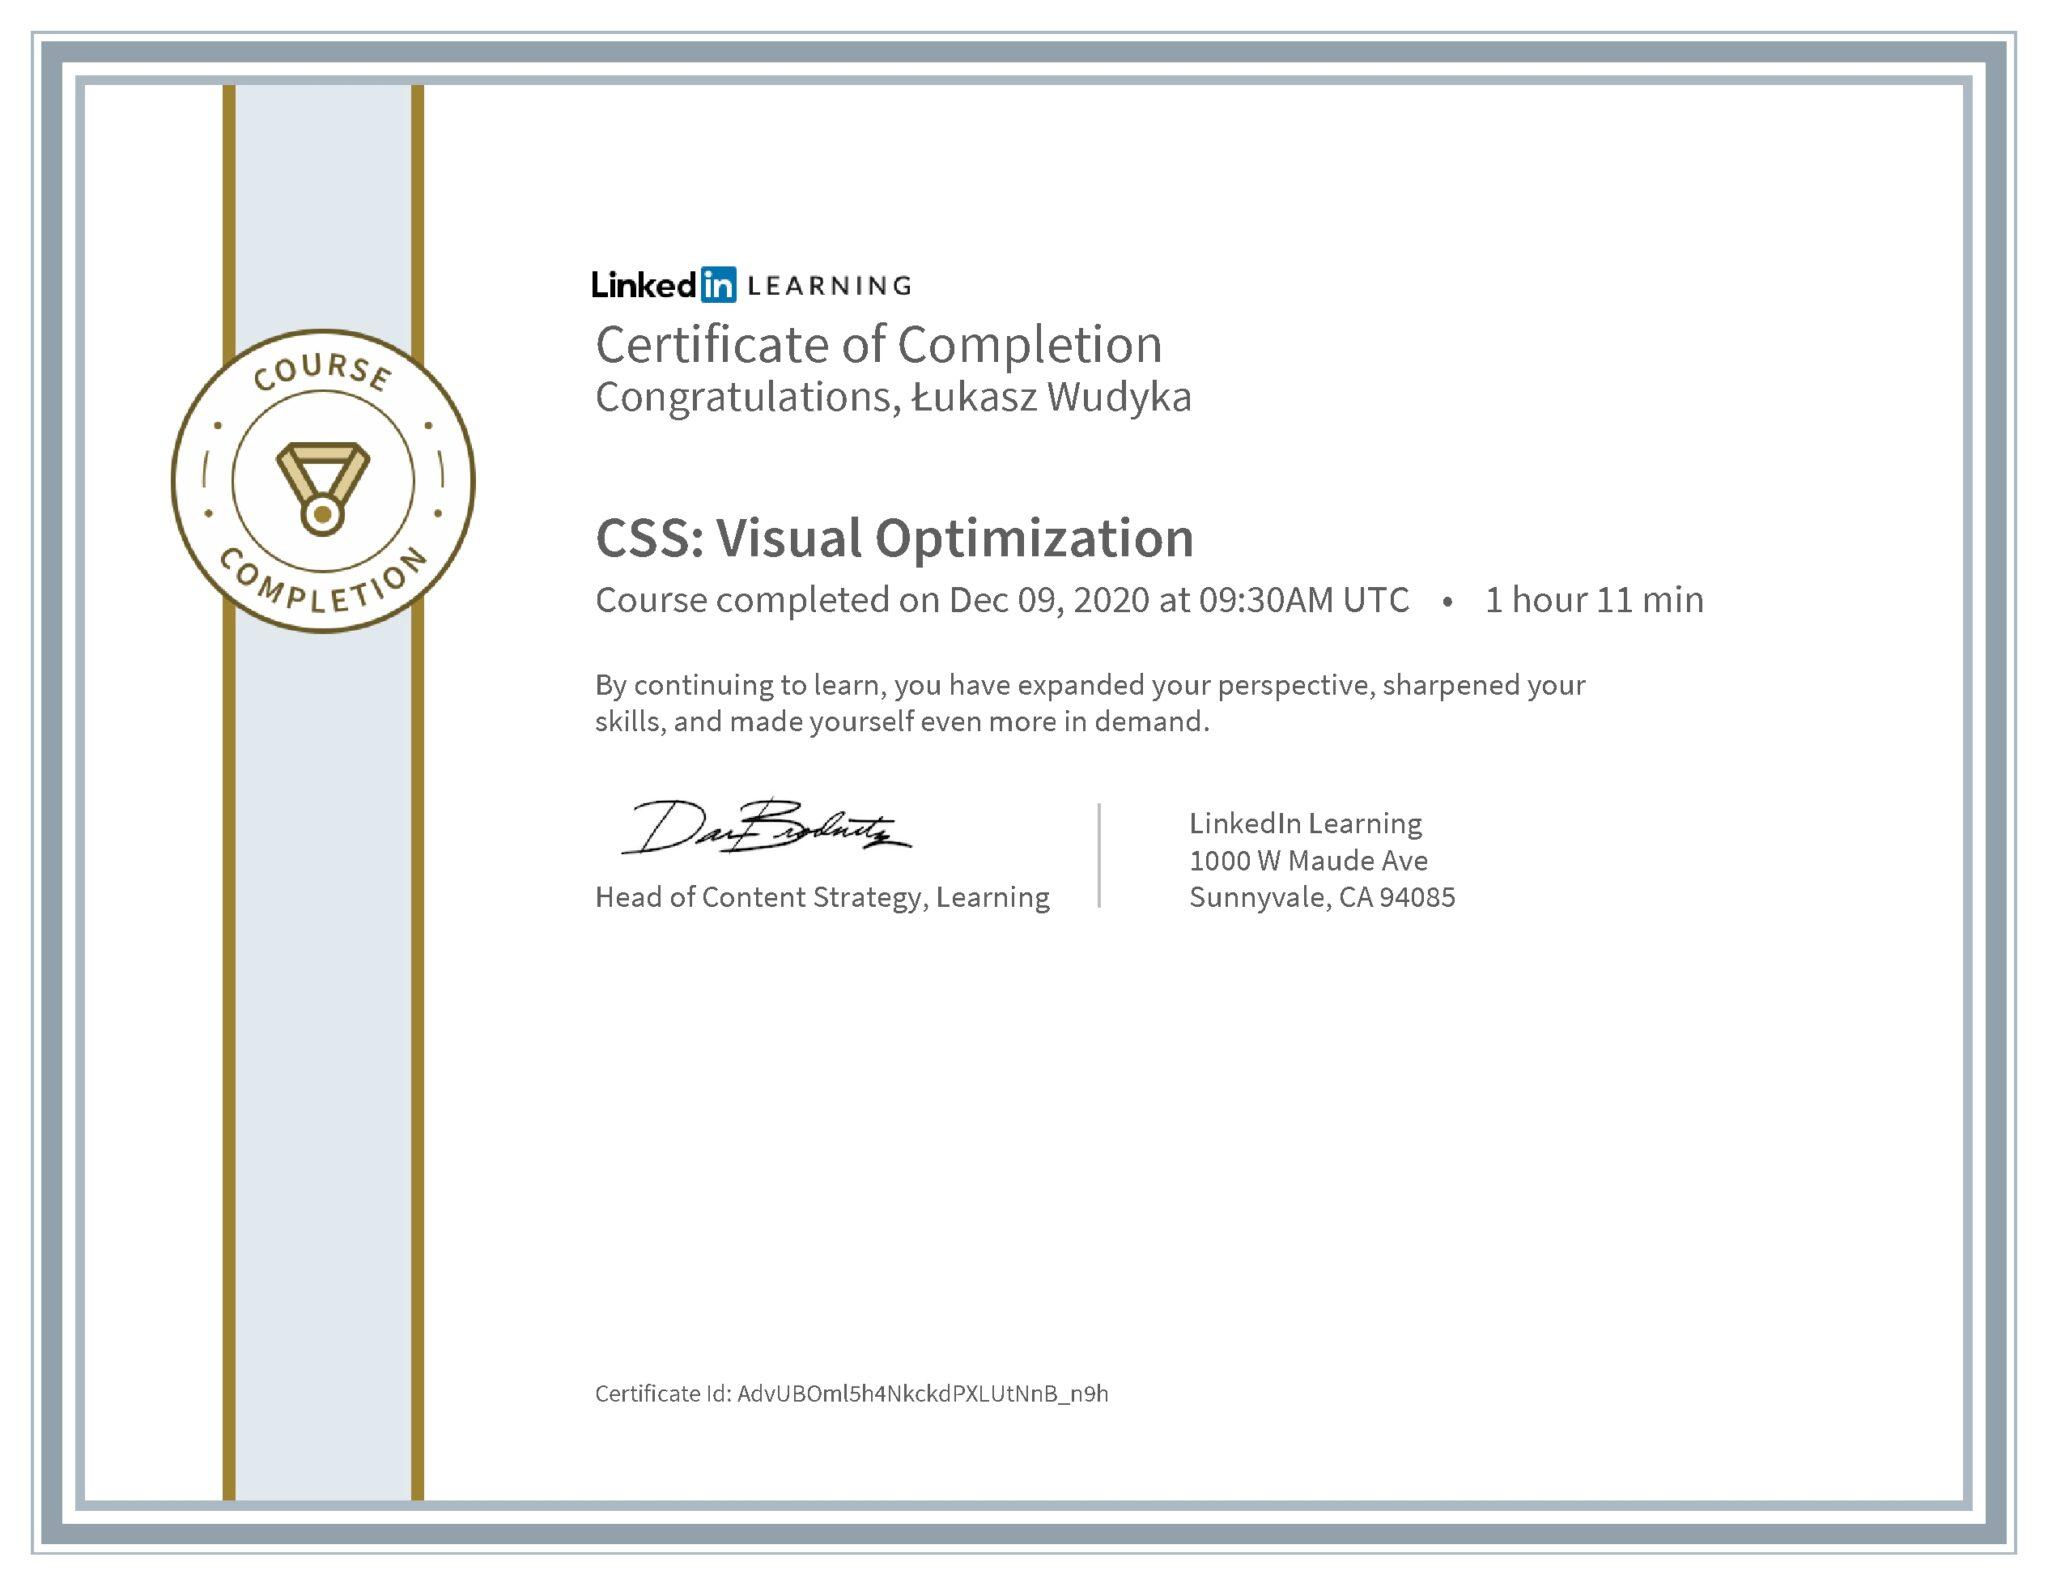 Łukasz Wudyka certyfikat LinkedIn CSS: Visual Optimization